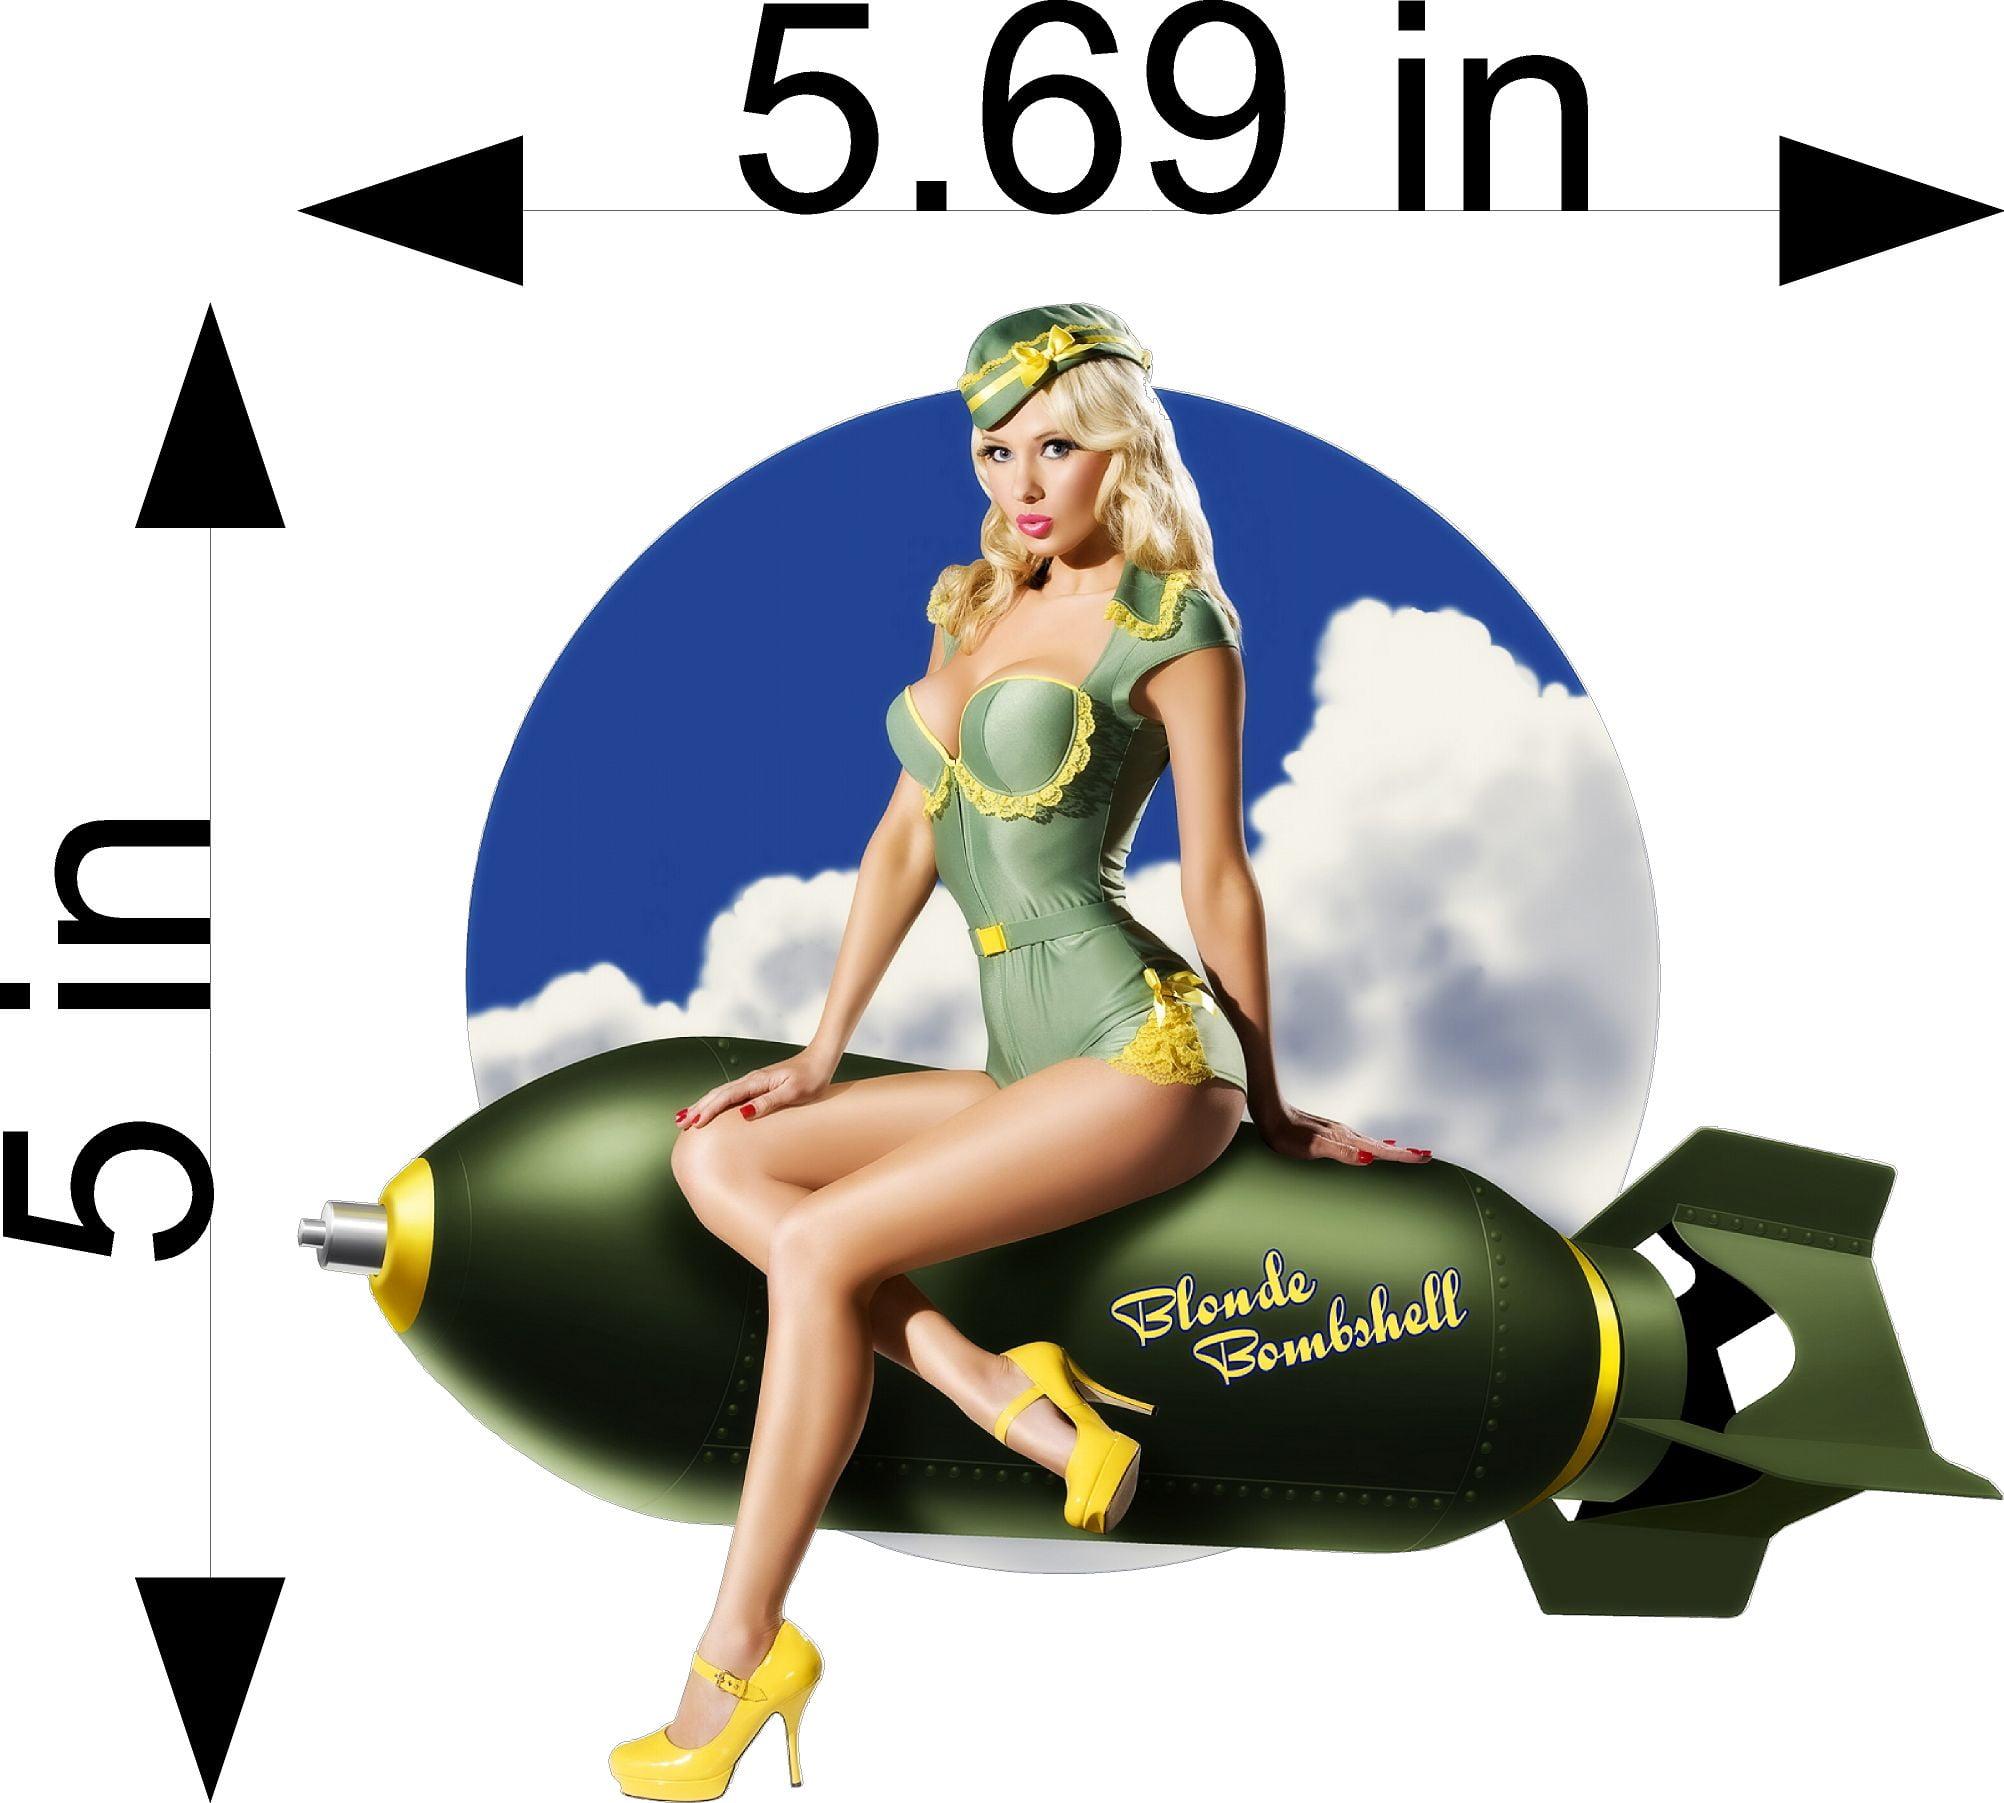 Blond Bombshell Babe Sticker